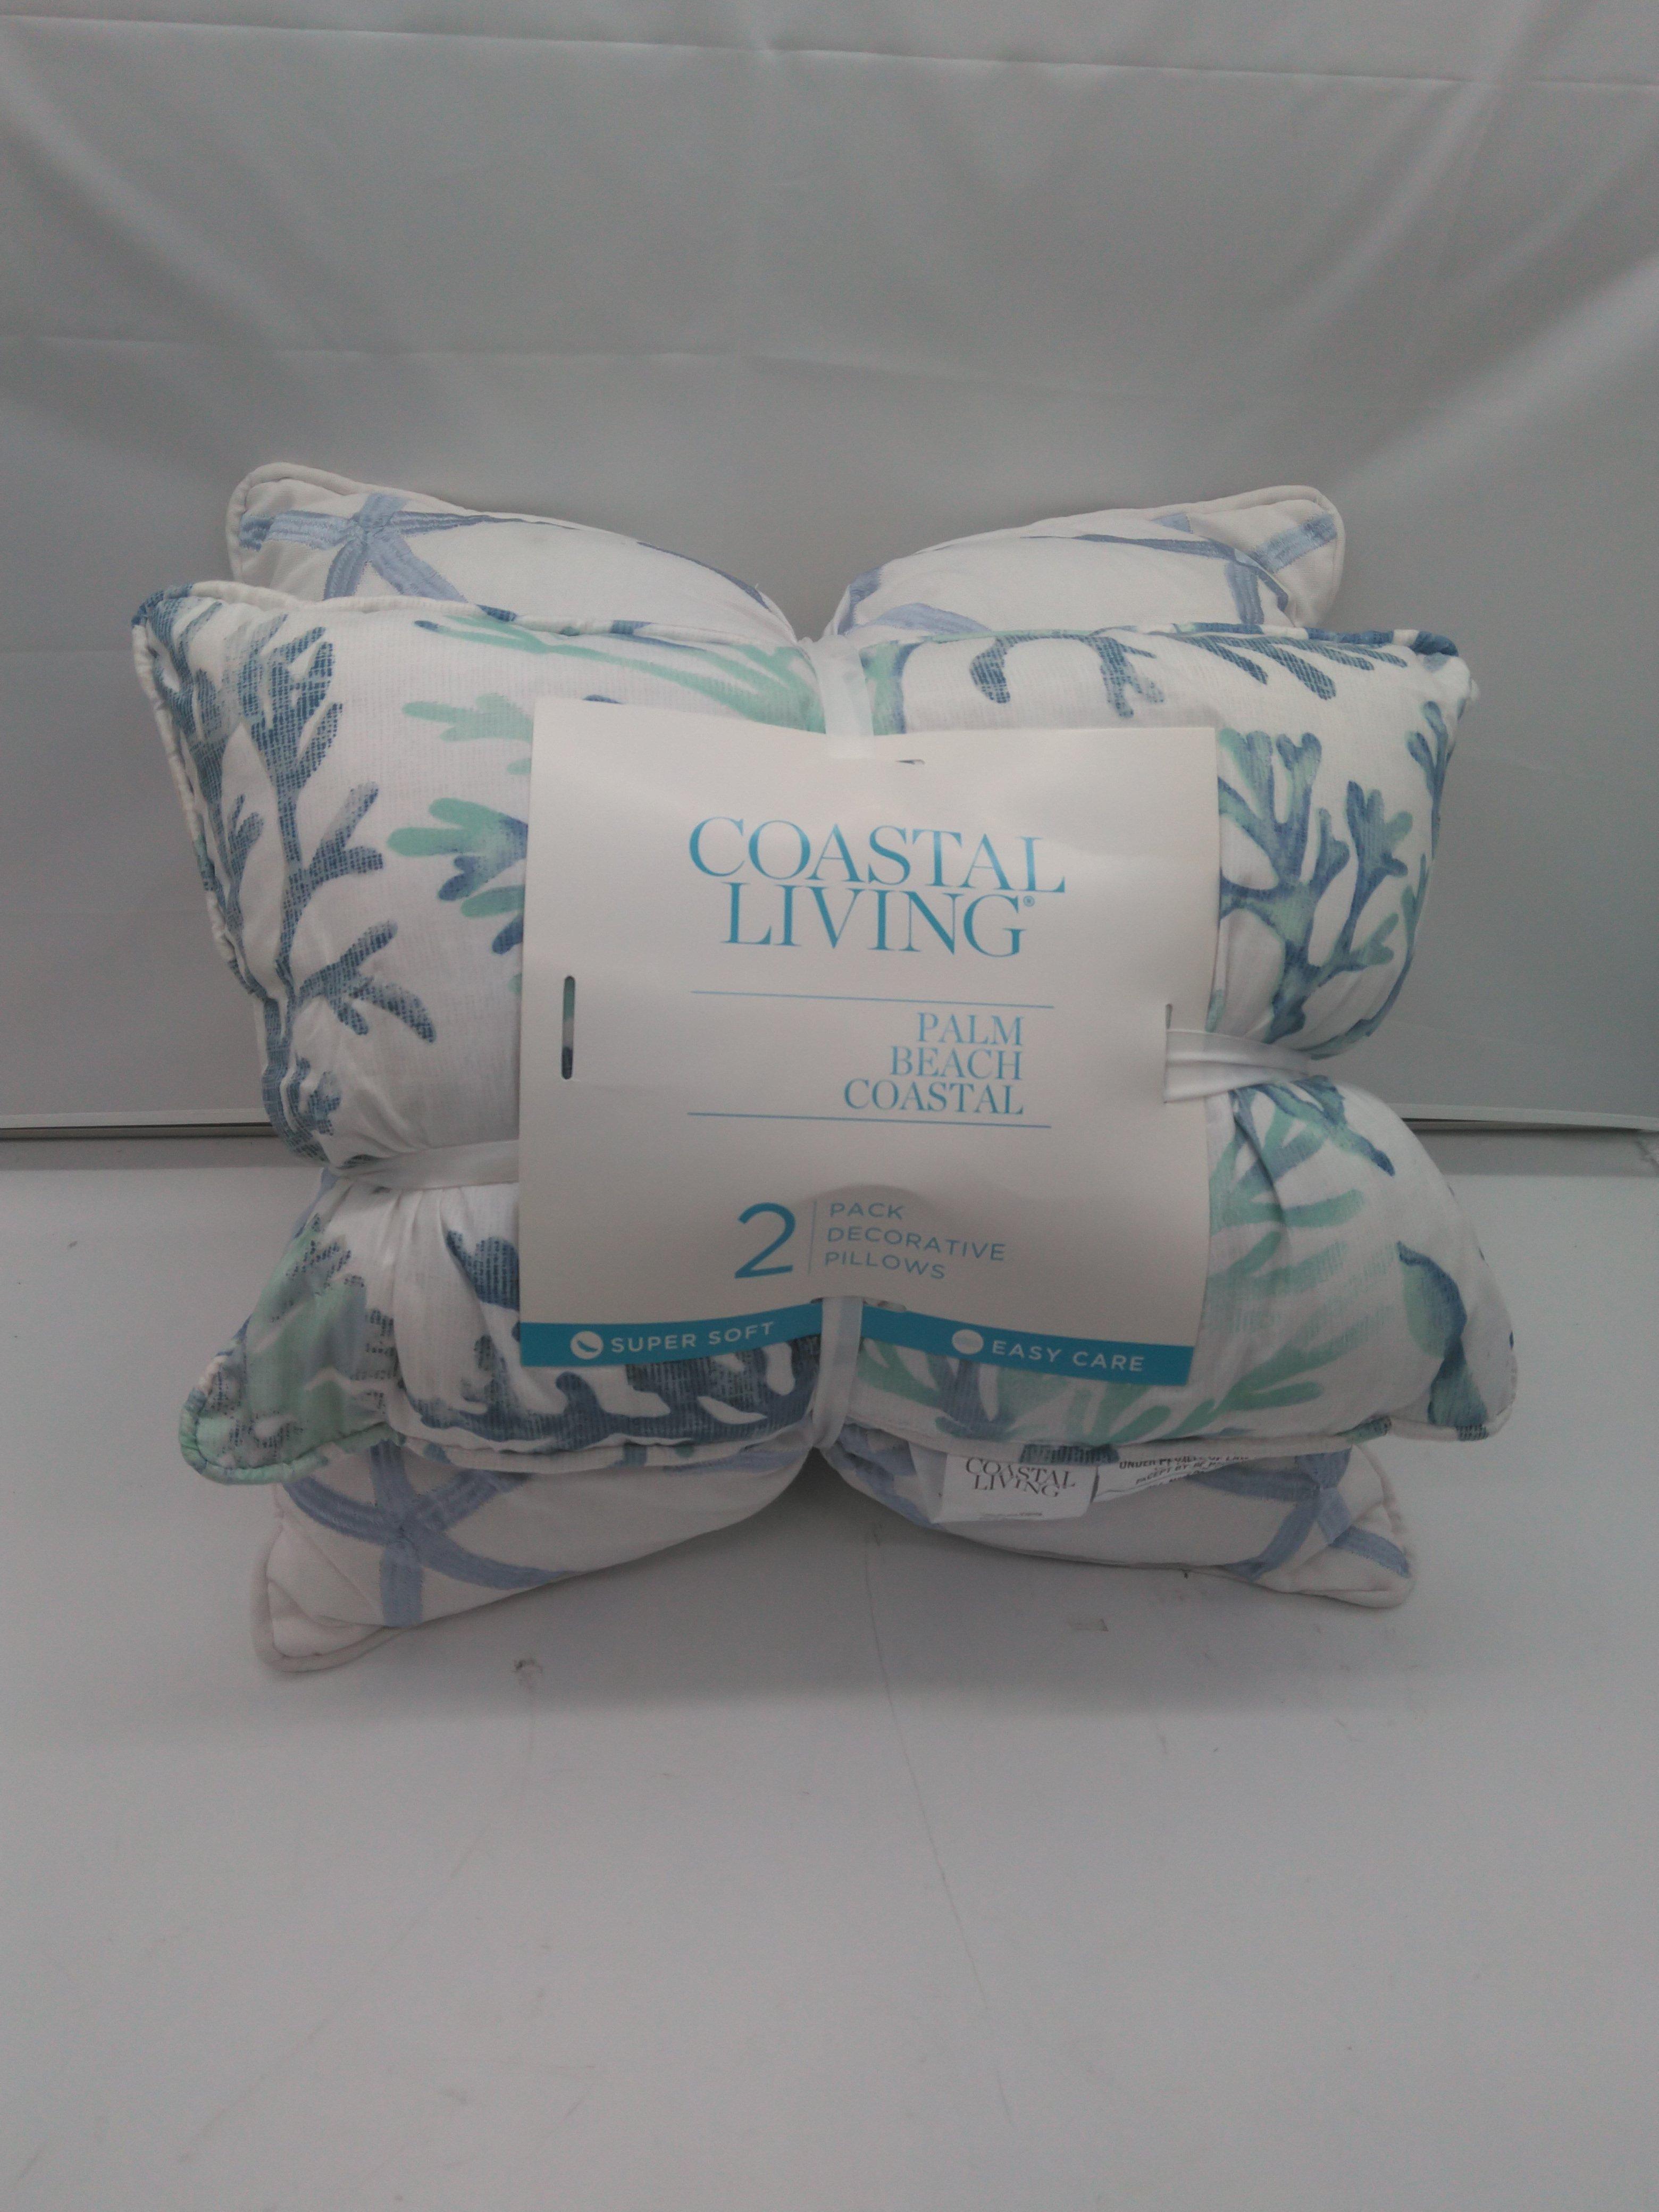 2 Pack Decorative Pillows